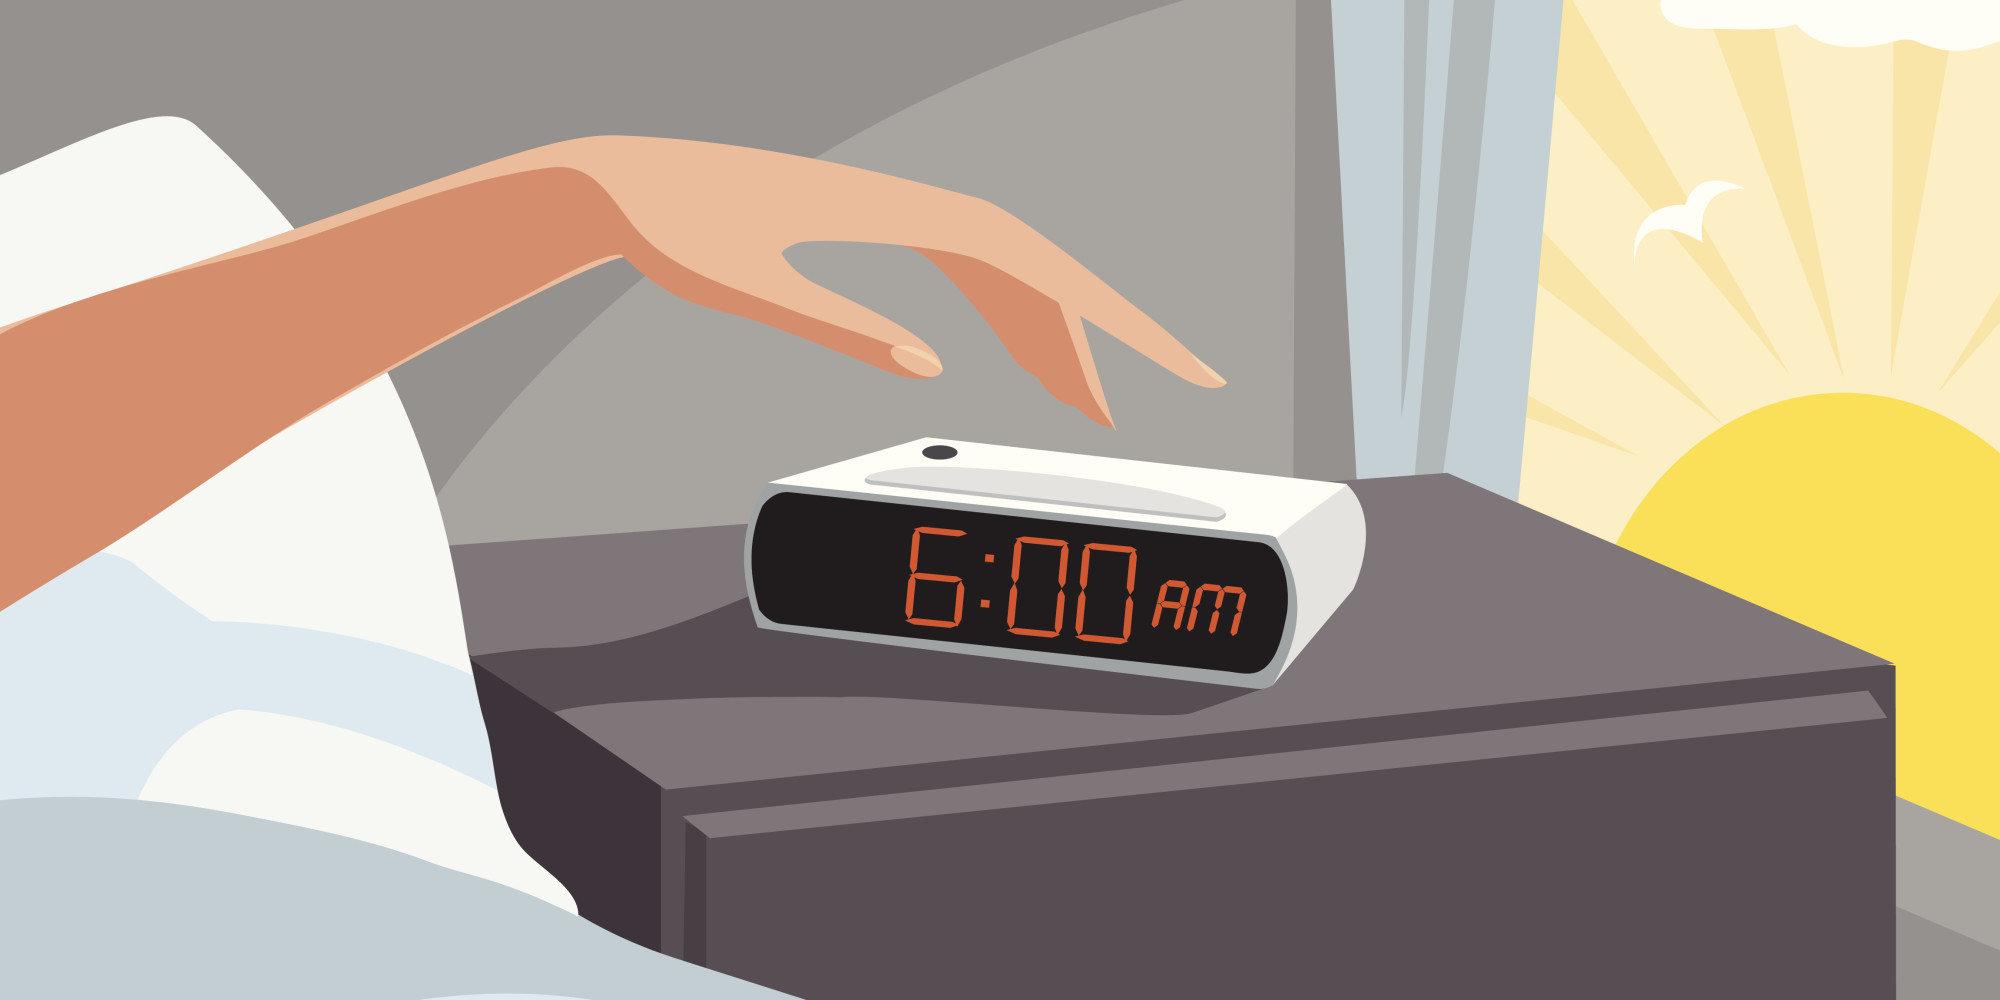 o-WAKE-UP-MINUTE-BEFORE-ALARM-facebook